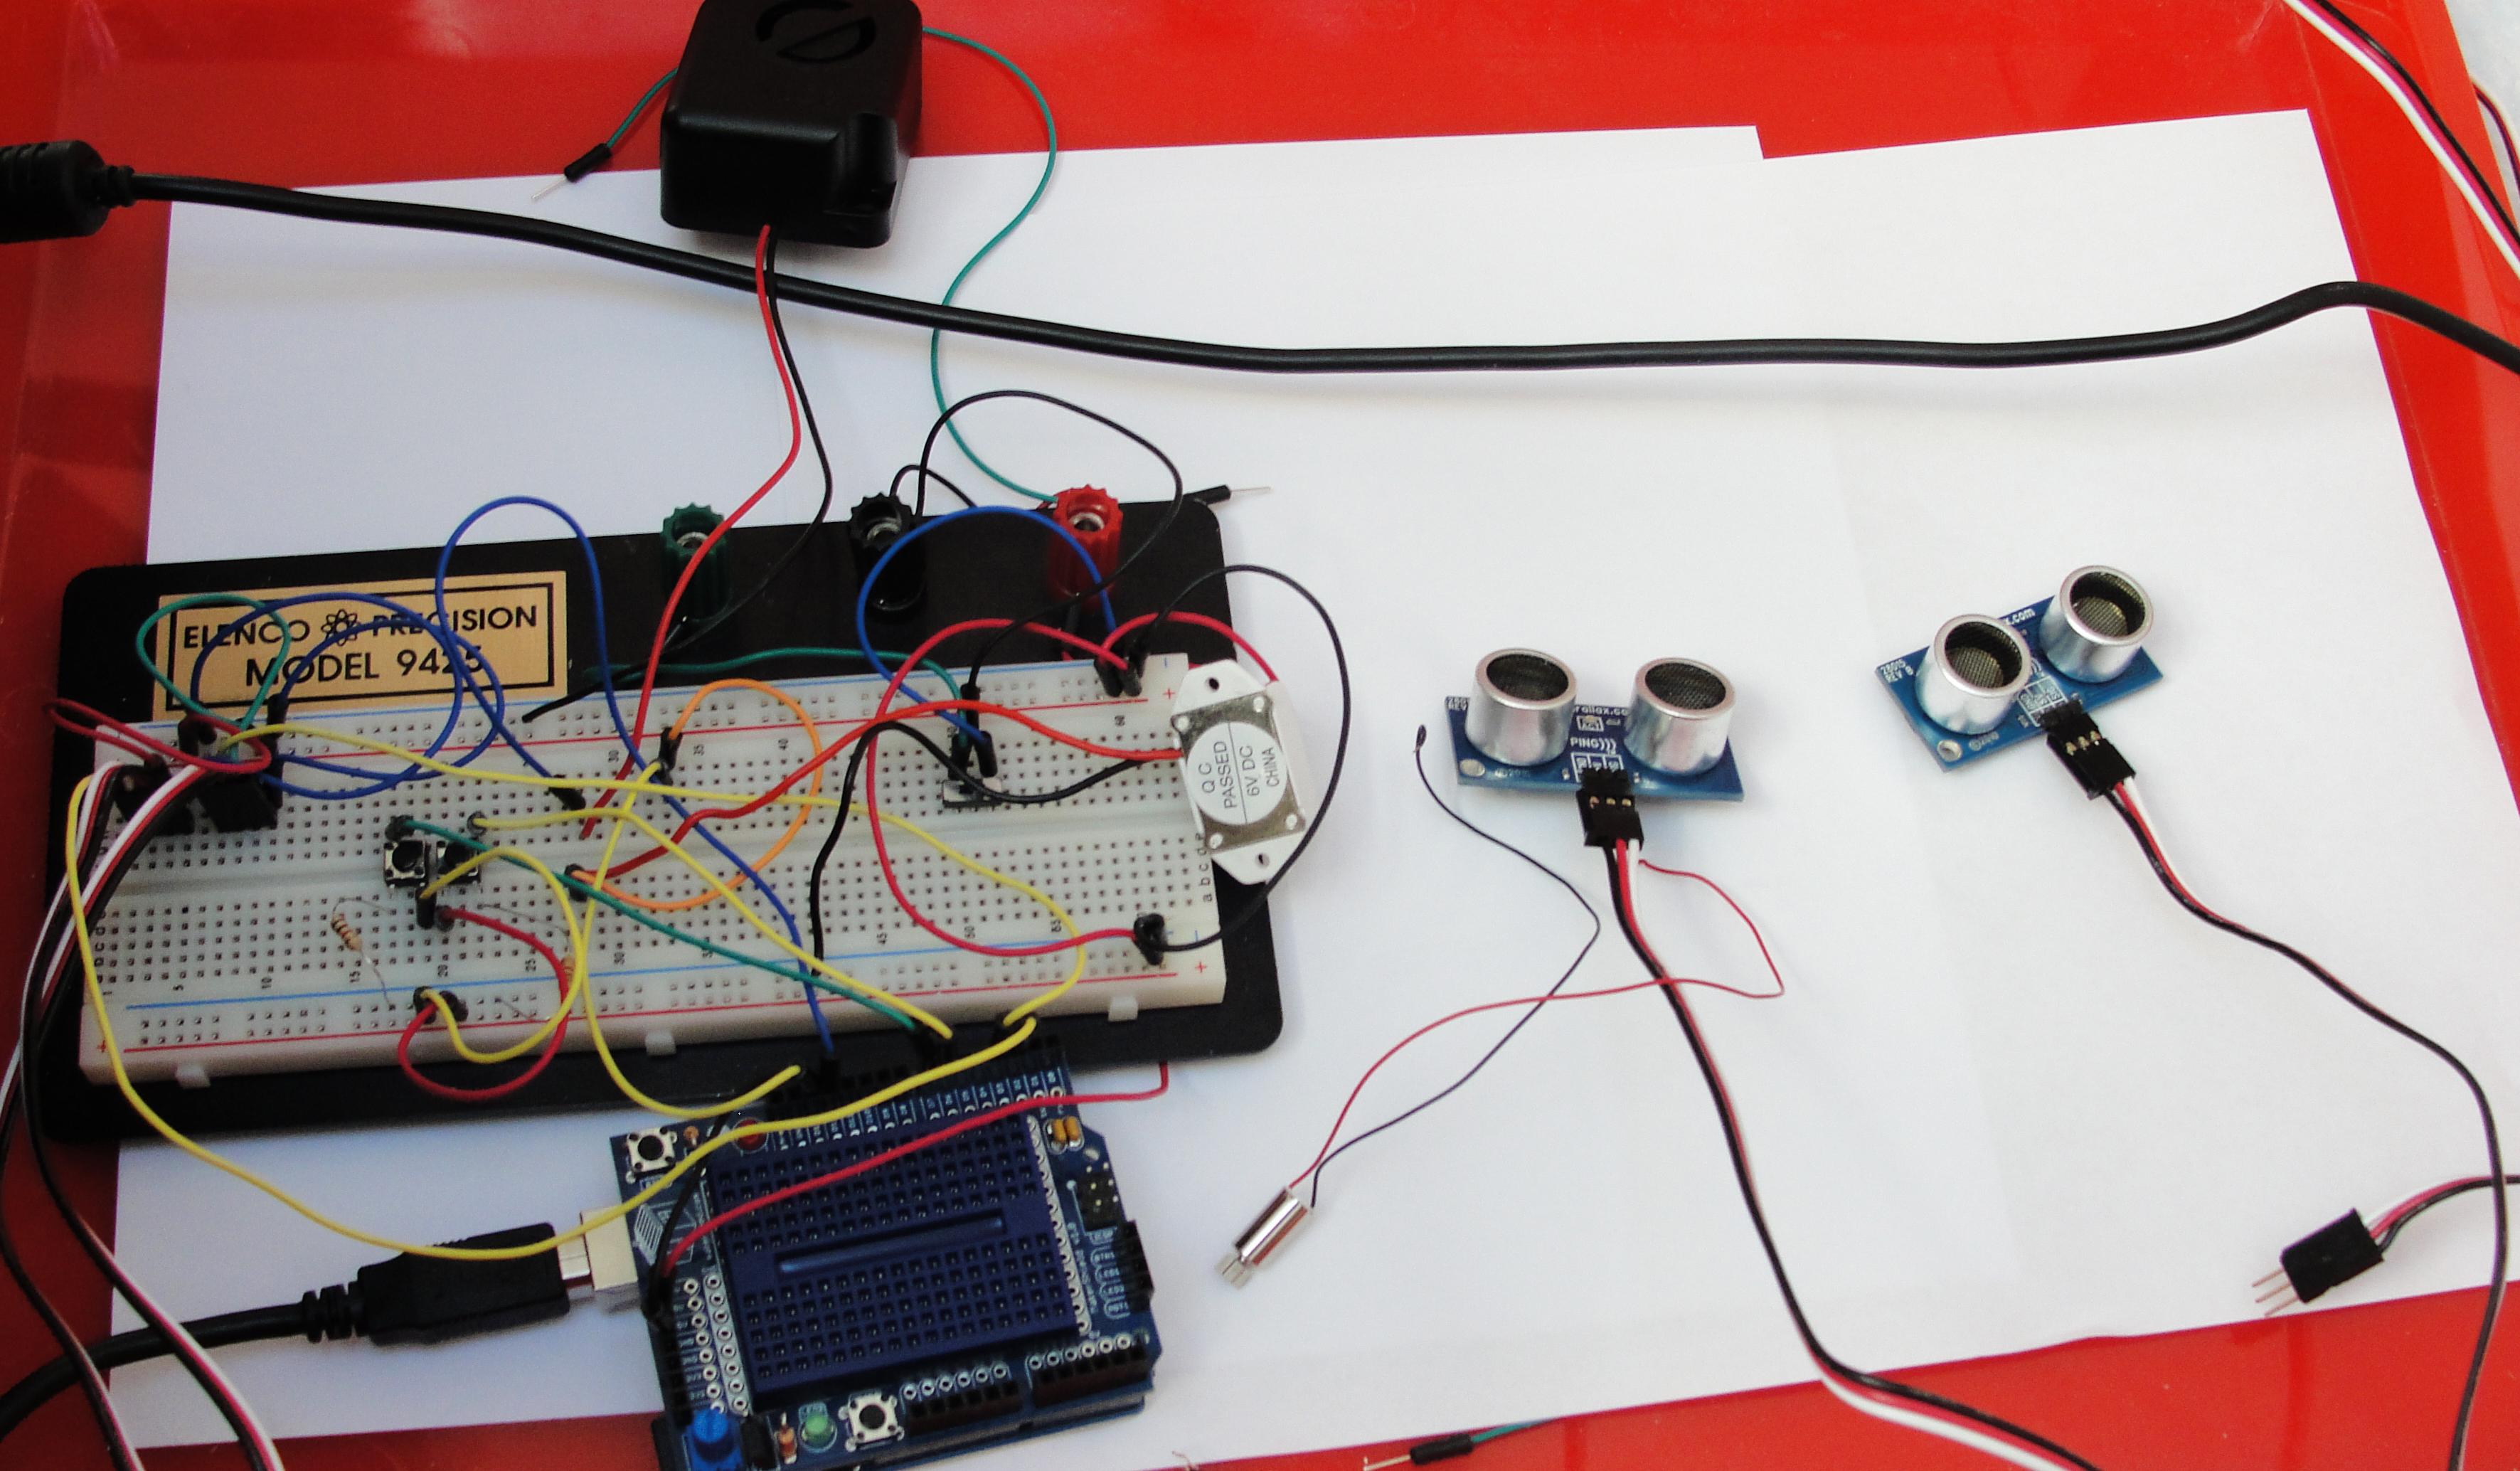 Sensors, breadboard, Arduino